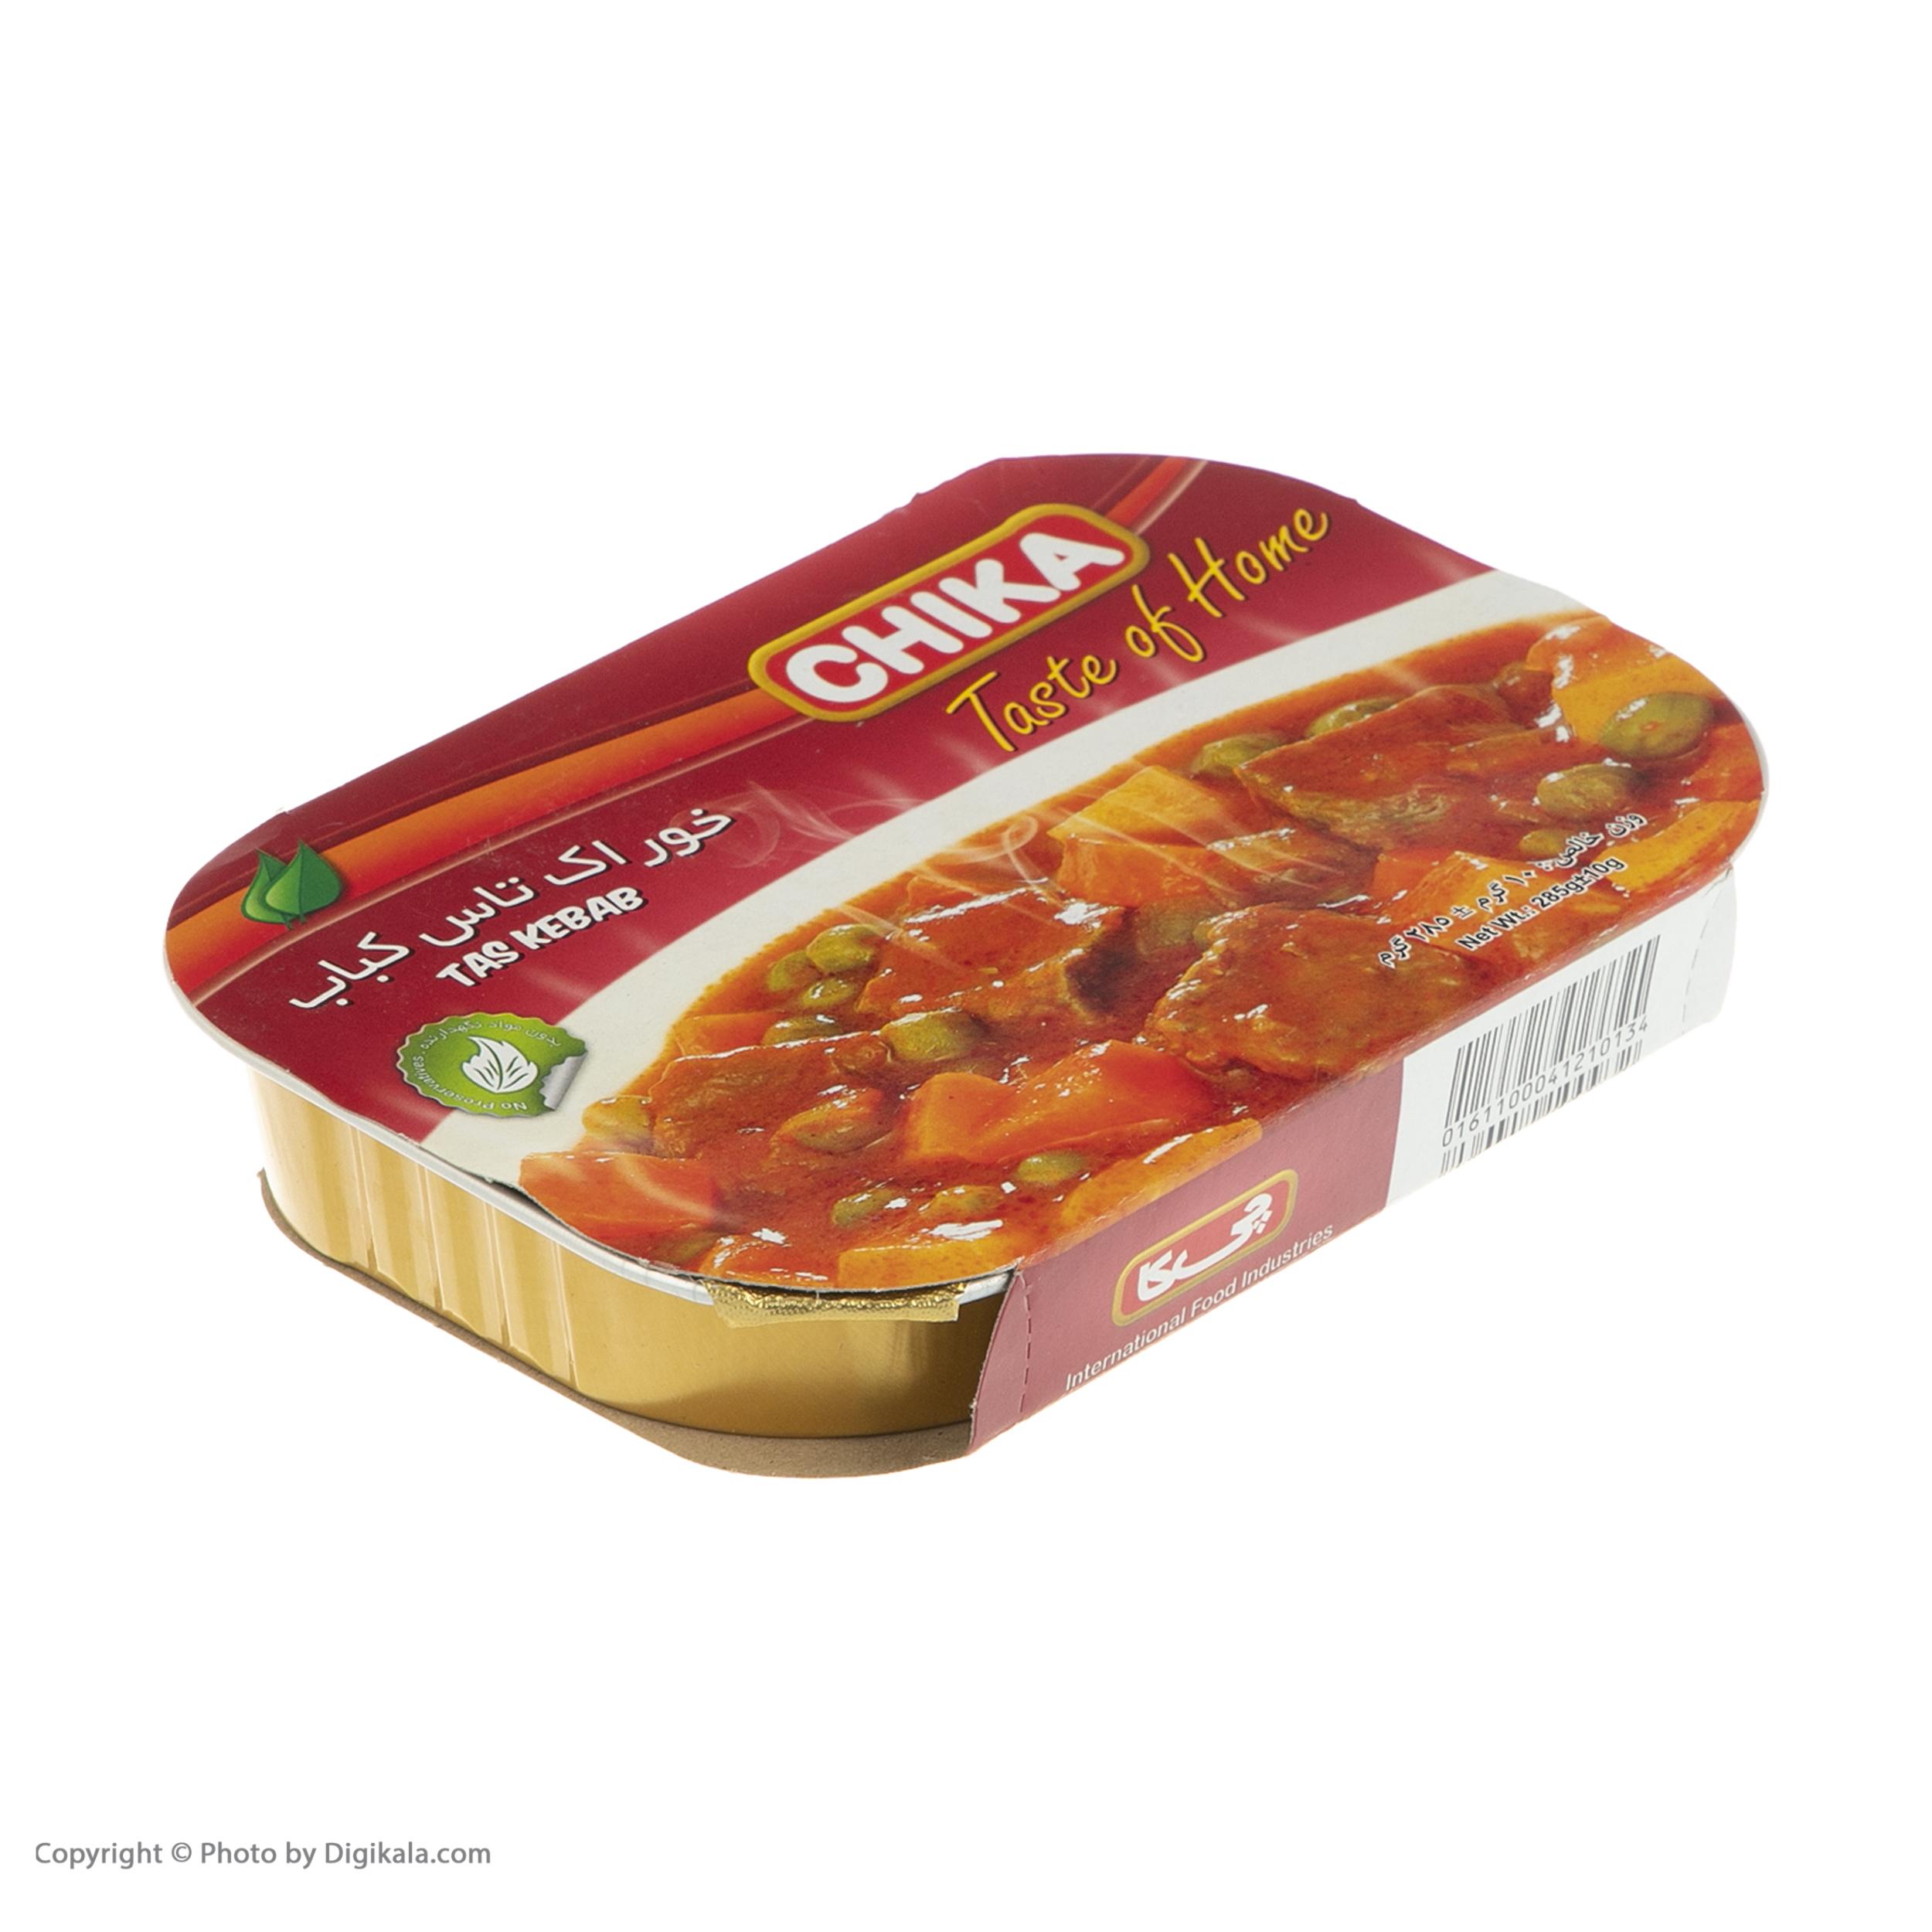 خوراک تاس کباب چیکا - 285 گرم main 1 1